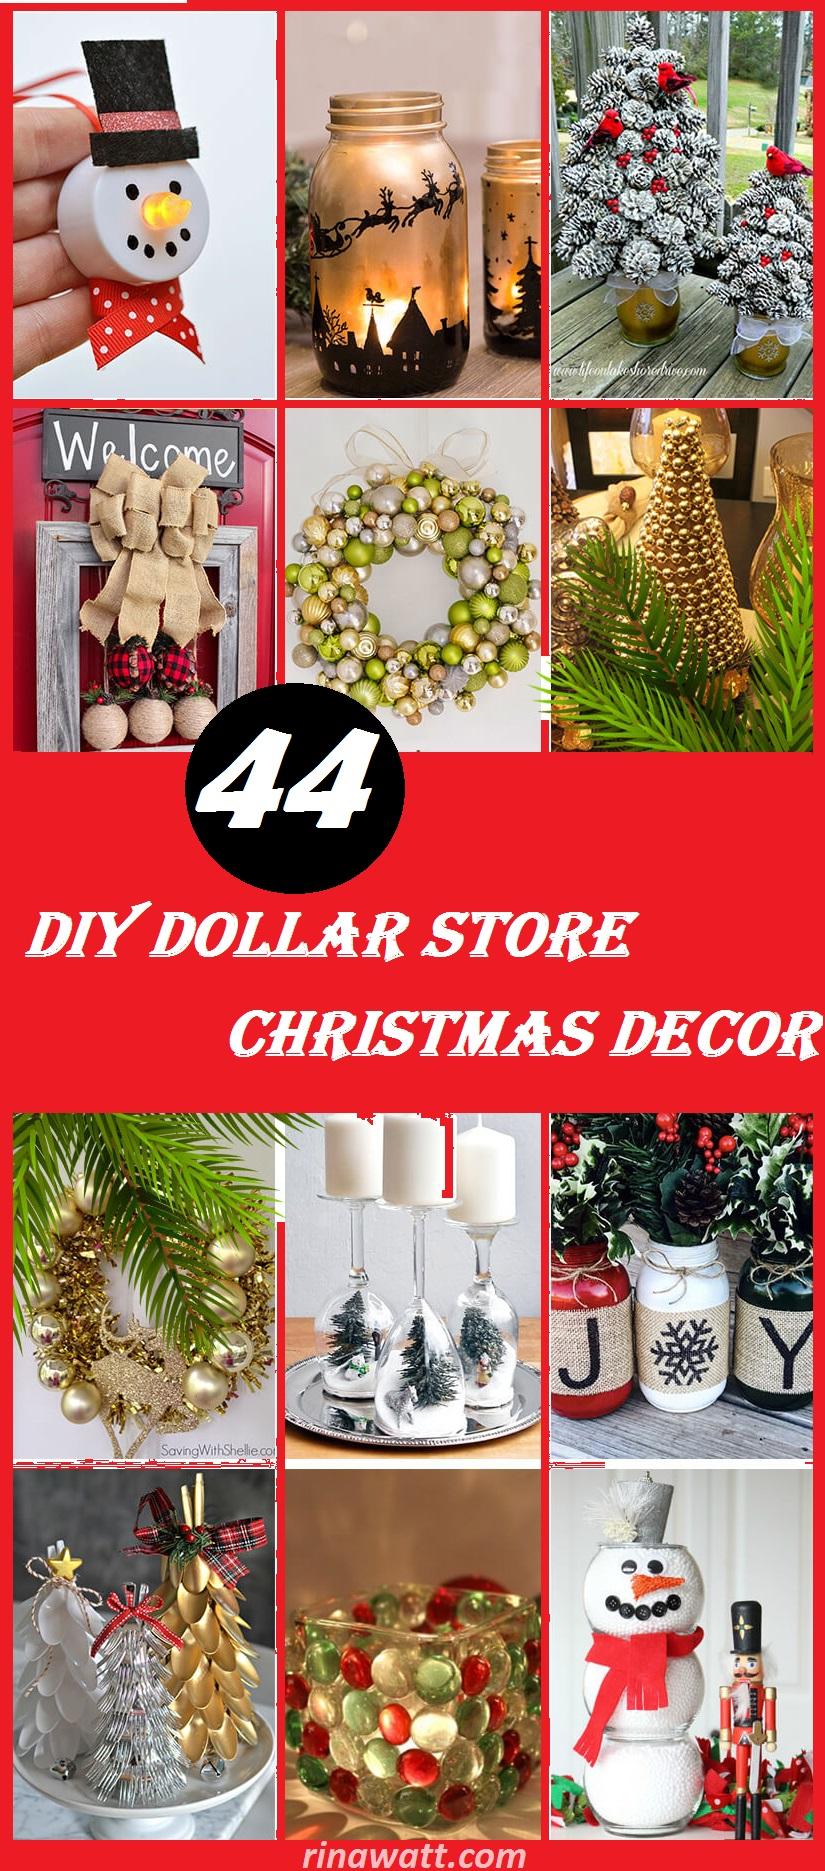 44Creative DIY Dollar Store Christmas Decor Crafts that Require Little More than a Glue Gun